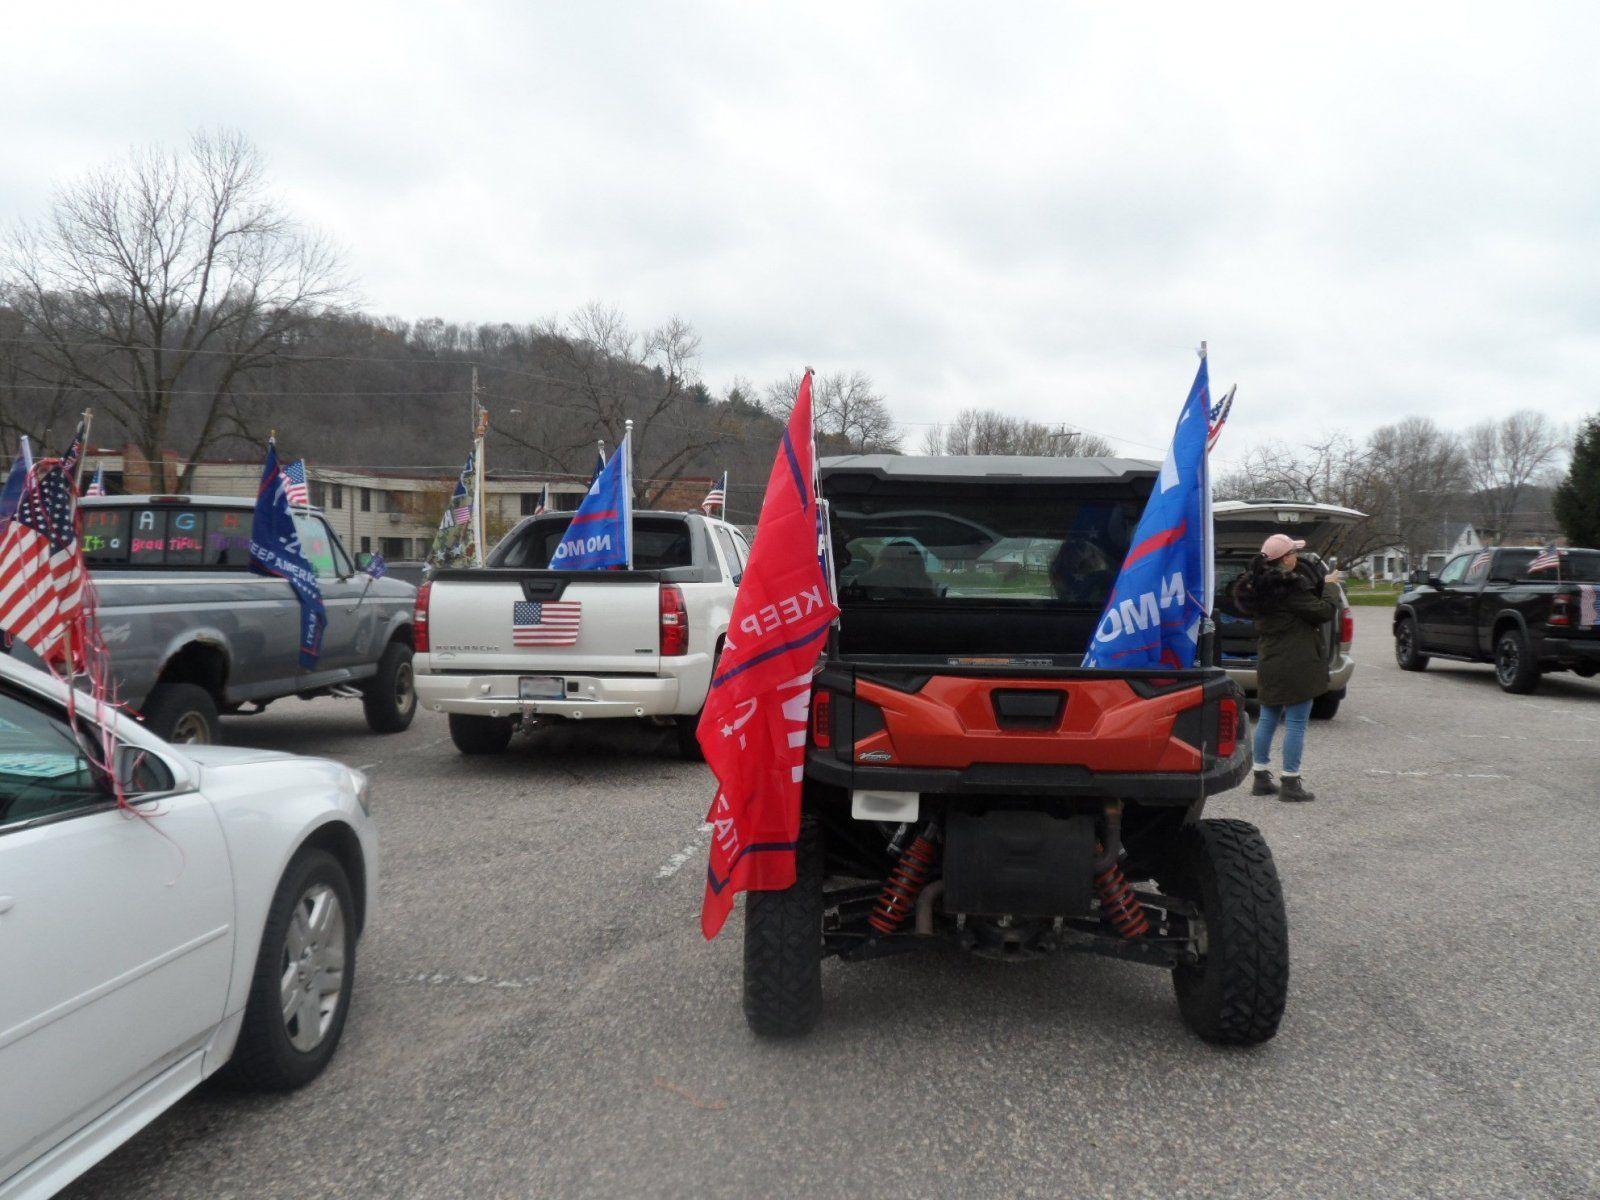 trump rally5.jpg